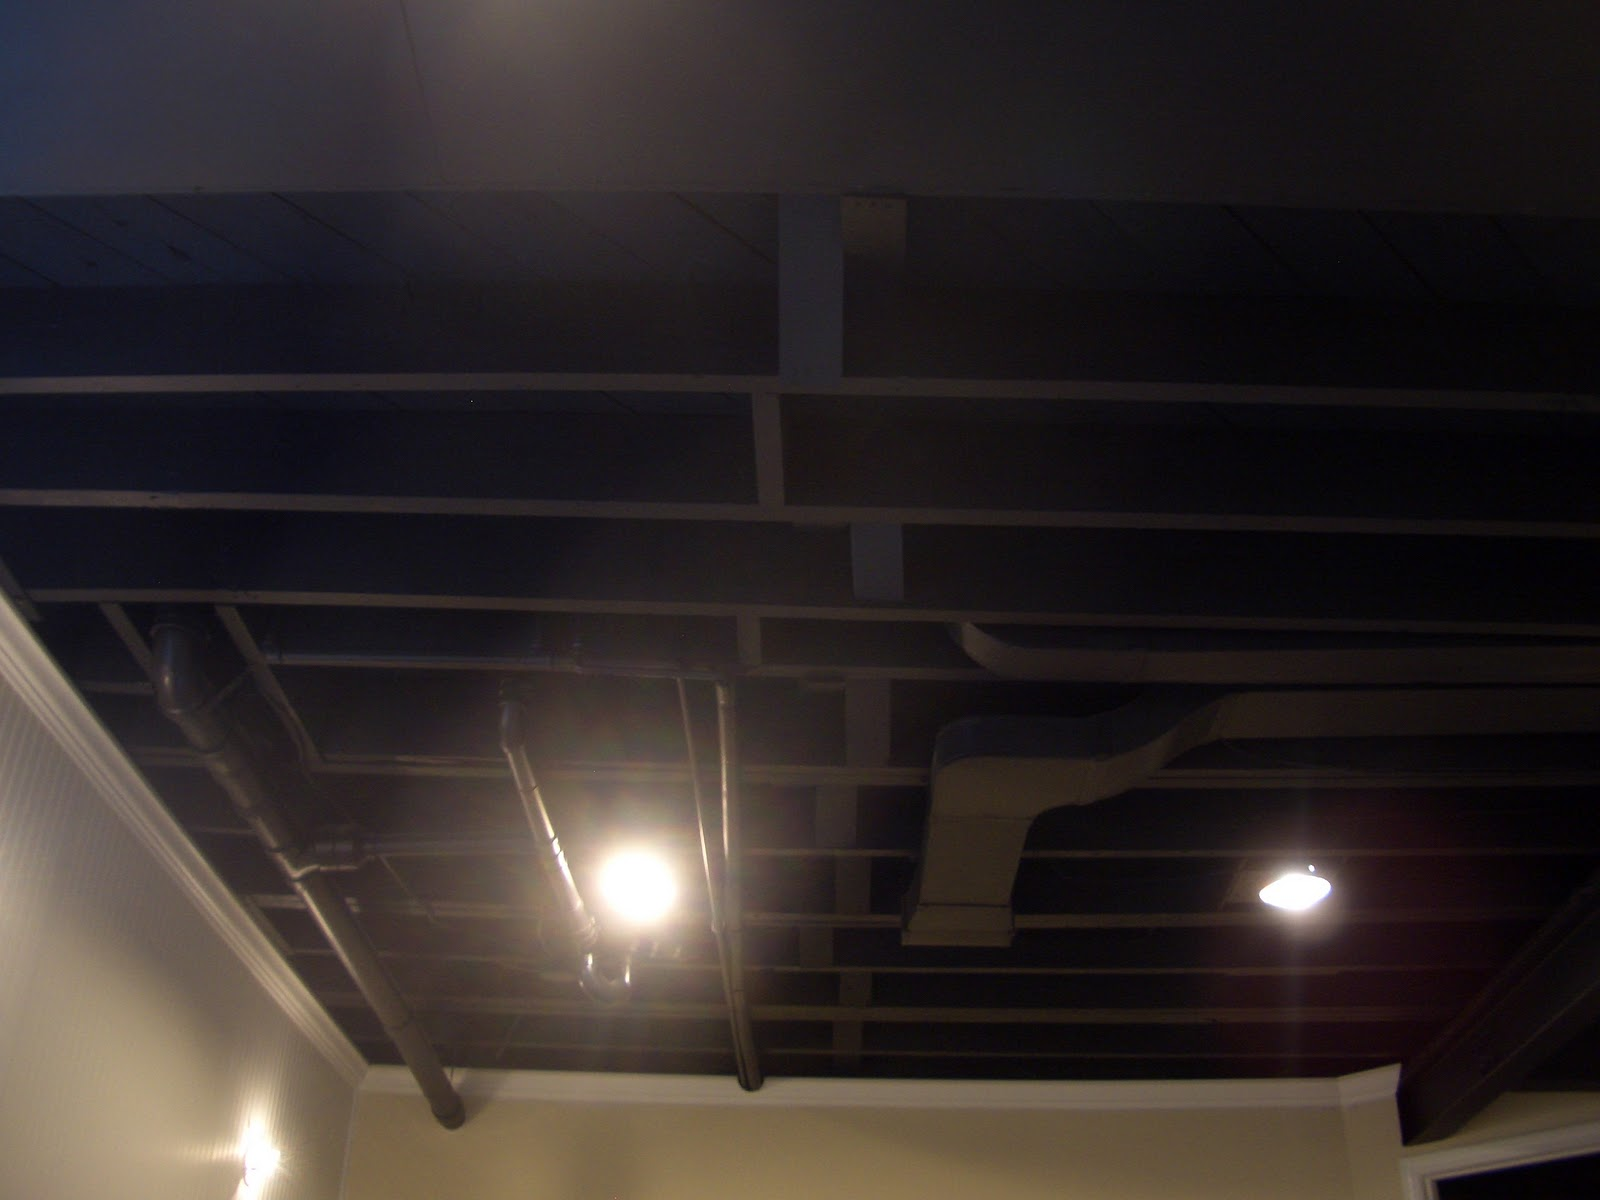 Basement Lighting Fixtures: Cool Home Creations: Finishing Basement: Black Ceiling